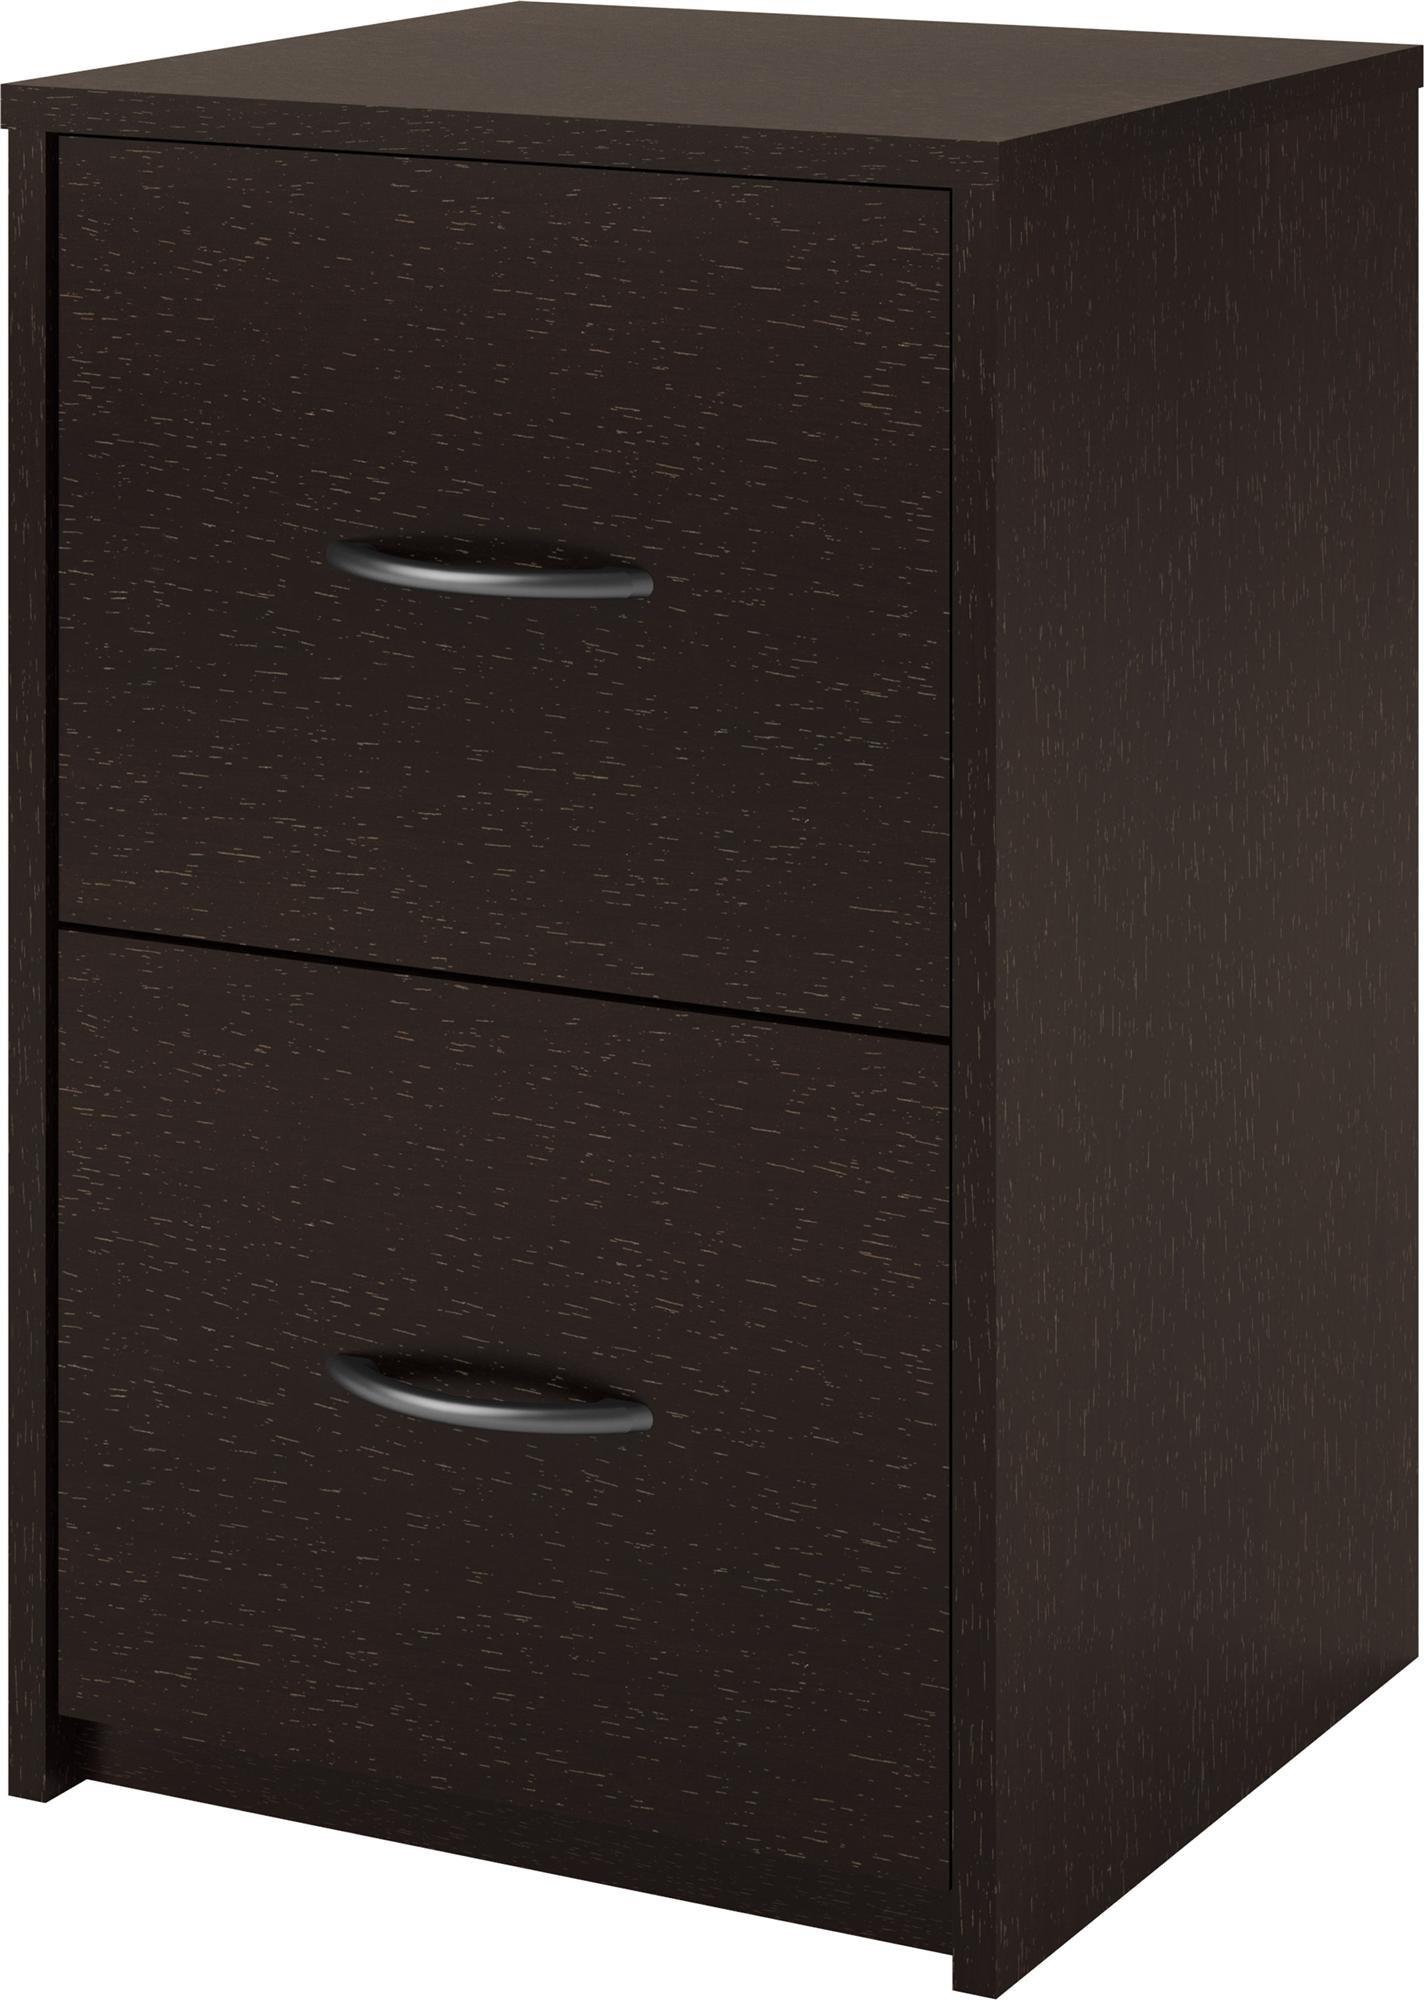 Ameriwood Home Core 2 Drawer File Cabinet, Espresso